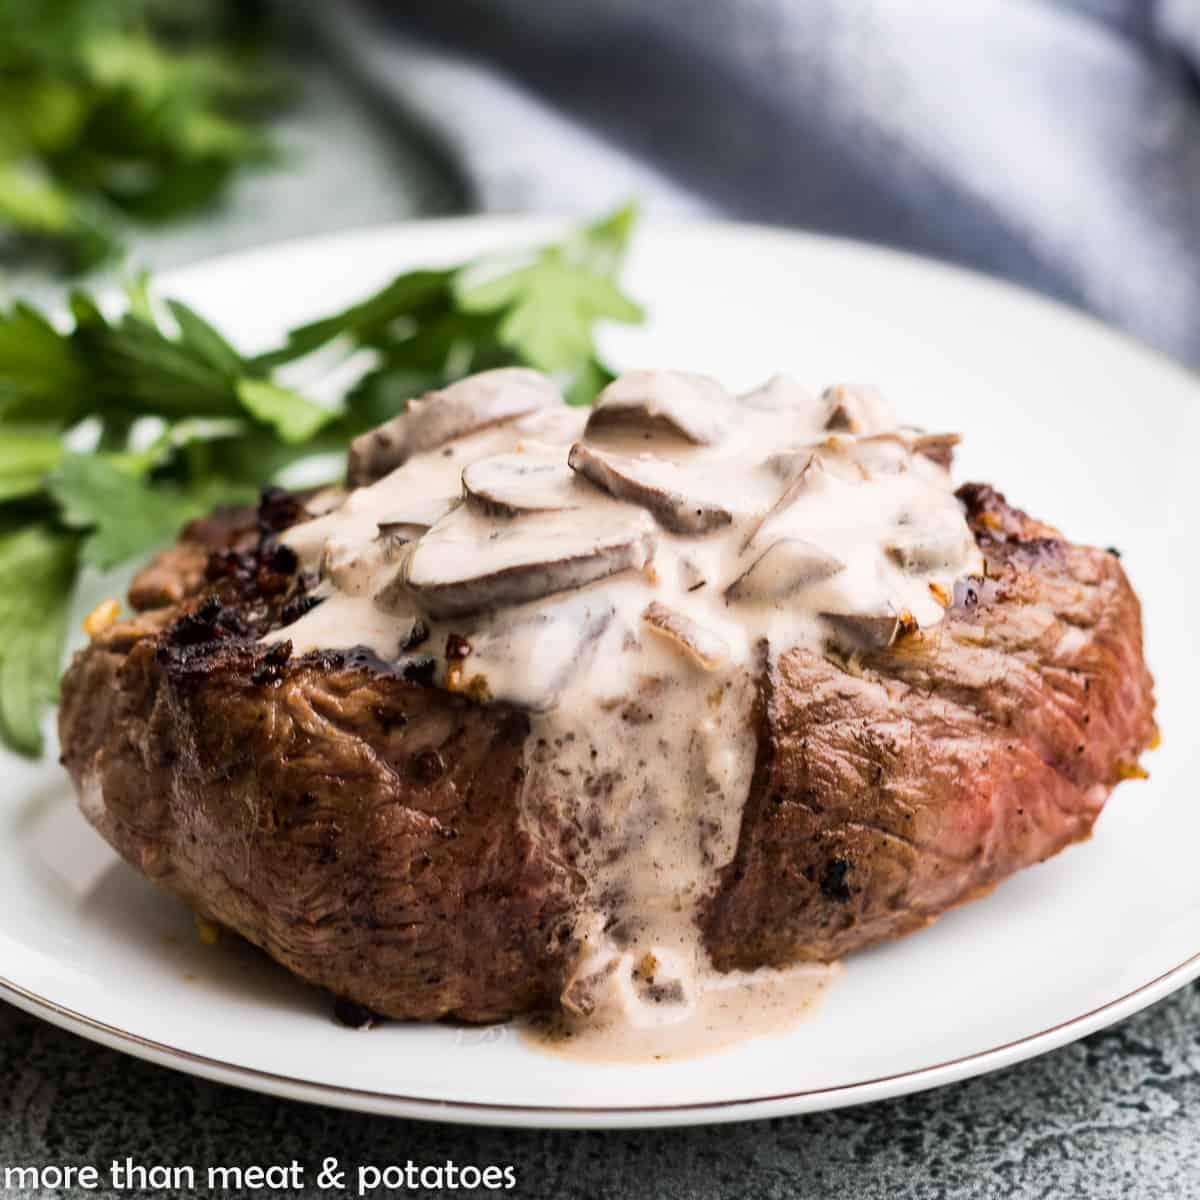 The creamy mushroom sauce poured over a steak.